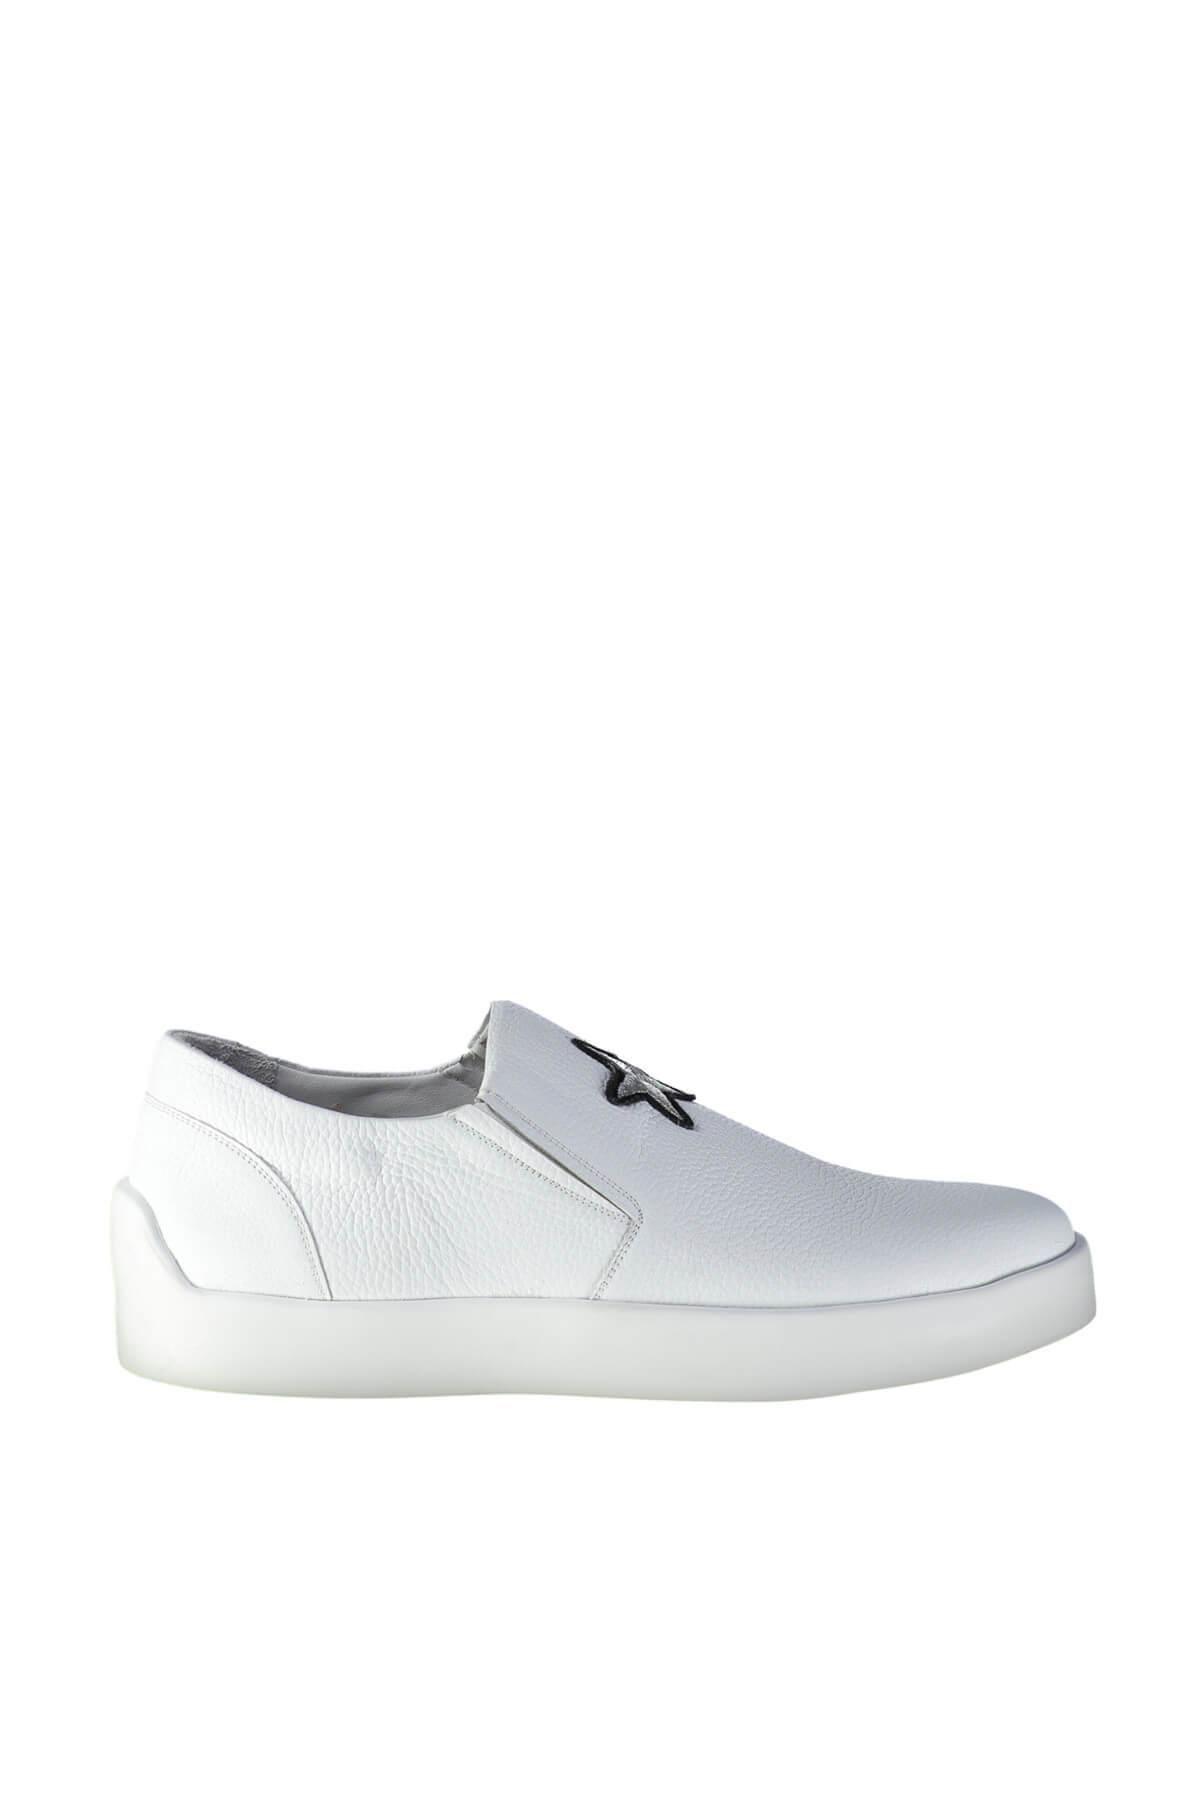 Pérola Negra Masculino Sneaker 120130005729